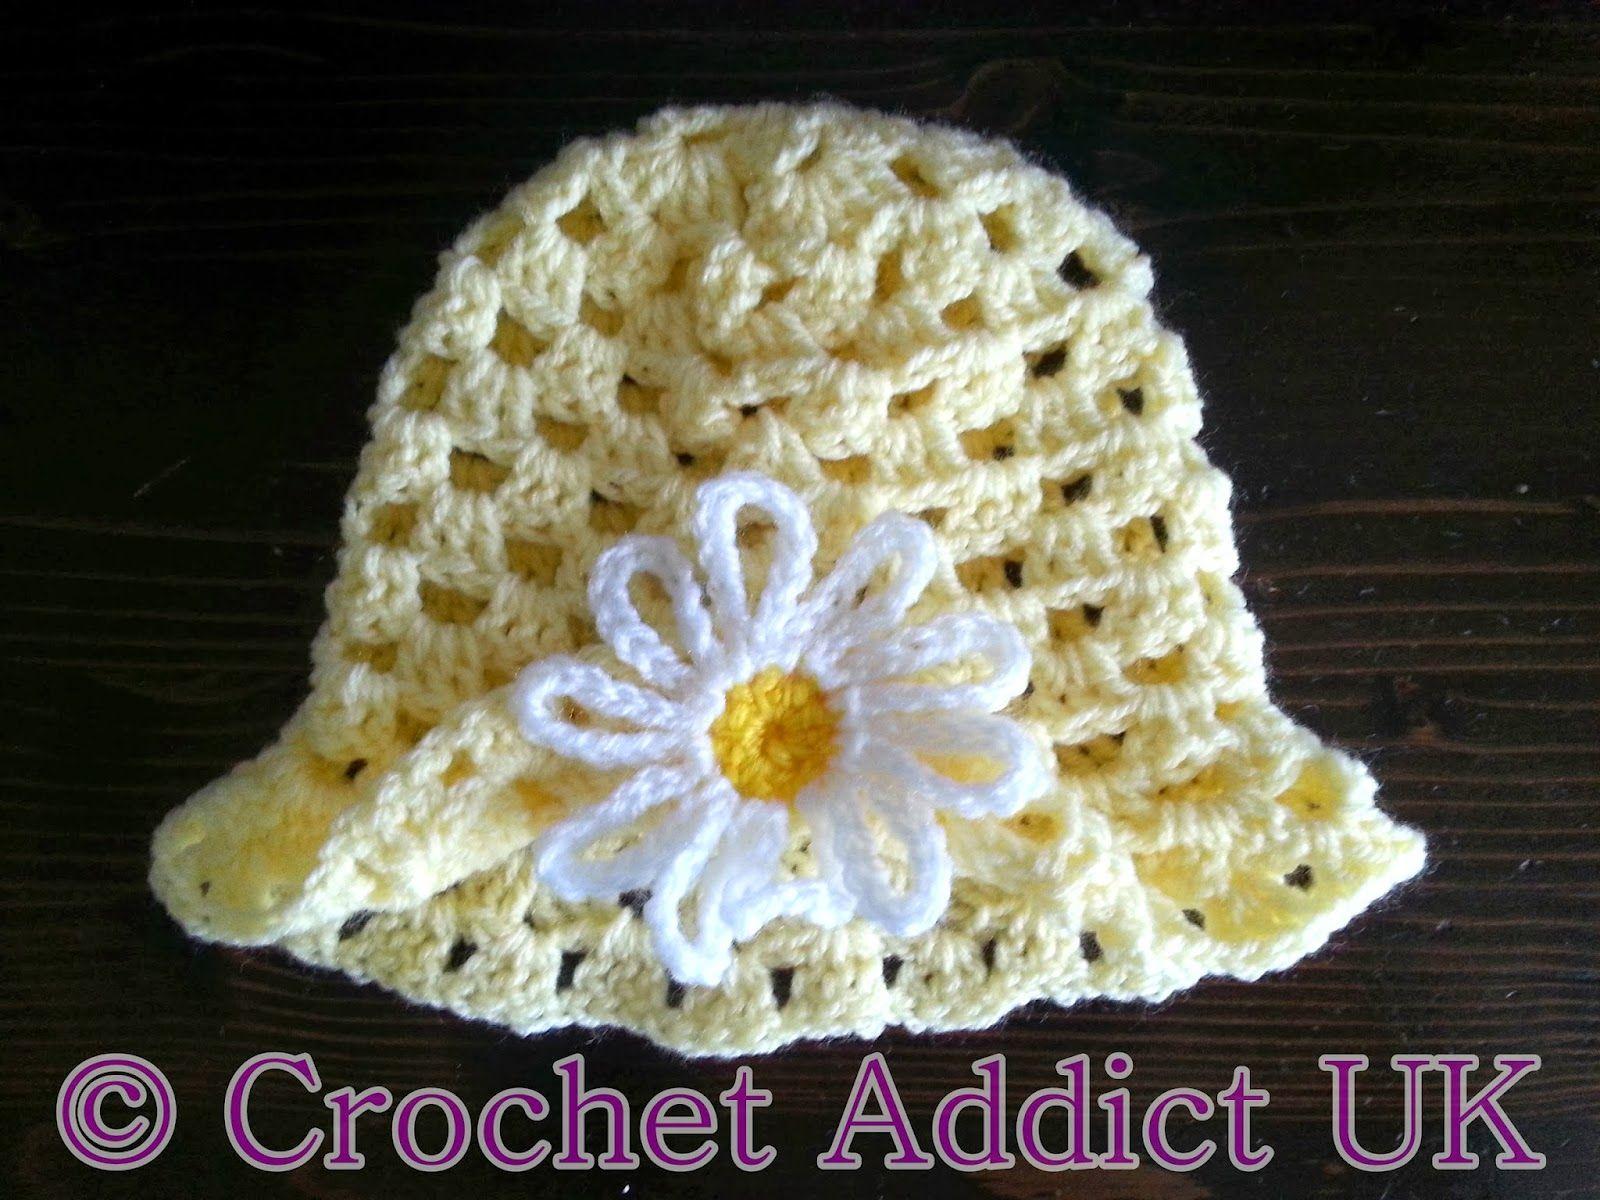 Crochet Addict Uk Things To Make With Yarn Hats Crochet